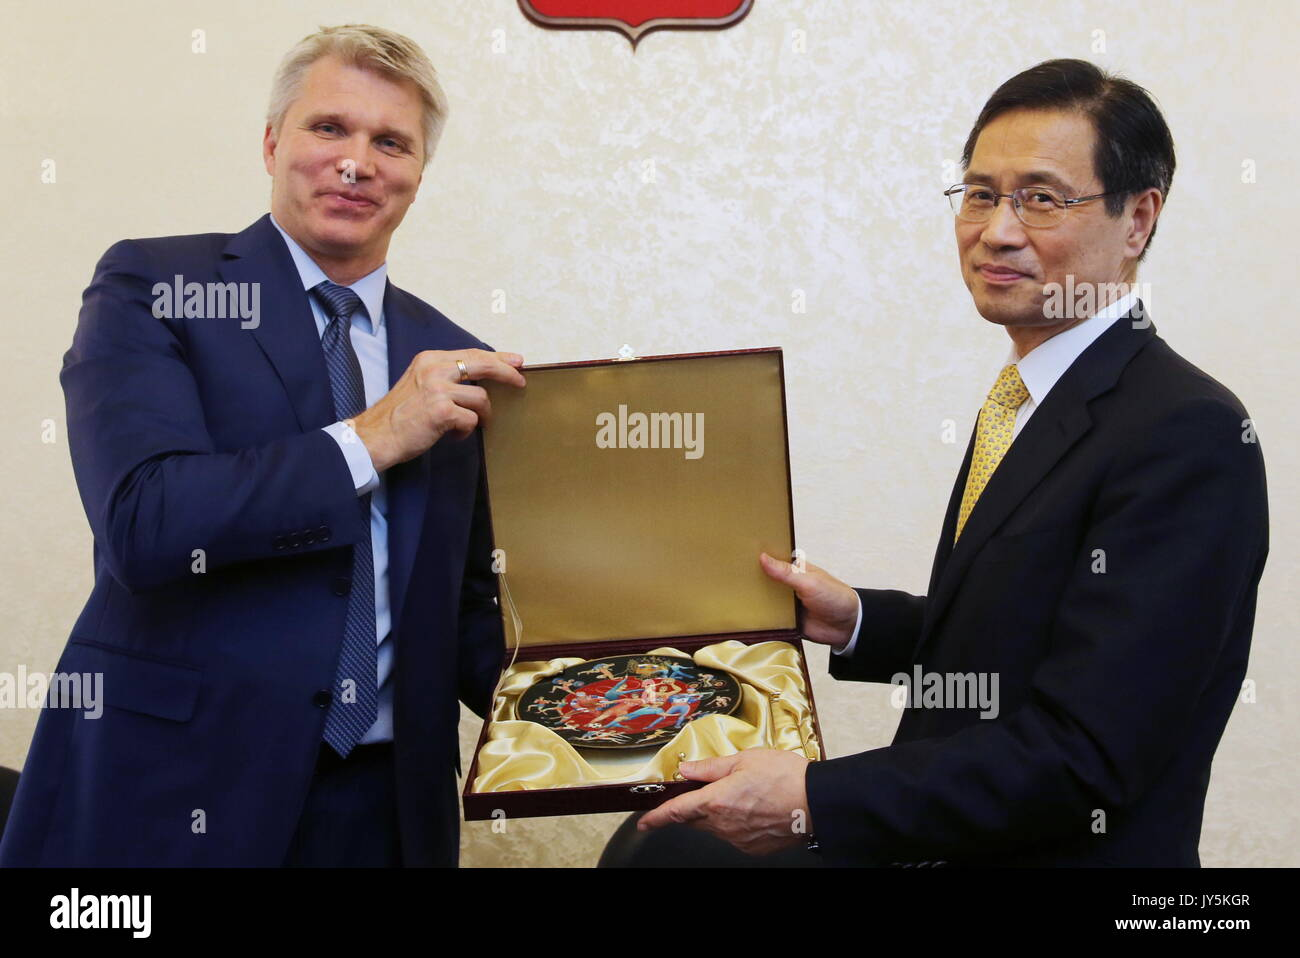 Moskau, Russland. 18 Aug, 2017. Russlands Sport Minister Pavel Kolobkov (L) trifft sich mit Südkorea Botschafter Stockfoto